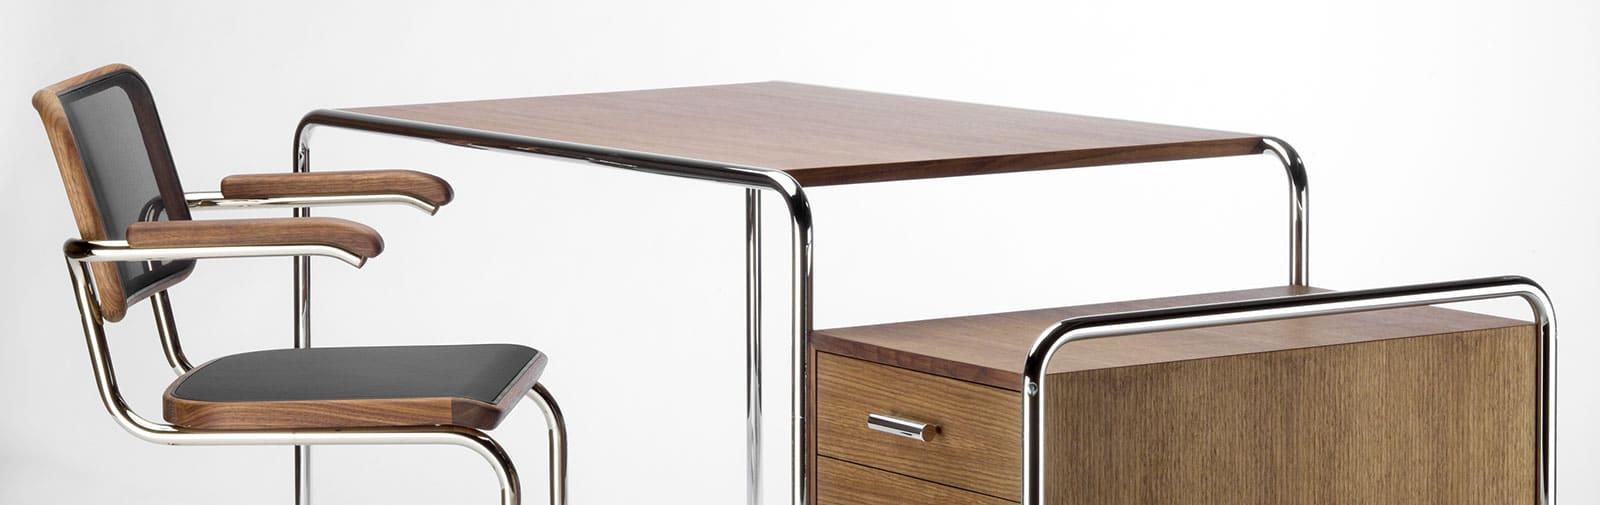 thonet stoel s 64 n interieurhof. Black Bedroom Furniture Sets. Home Design Ideas